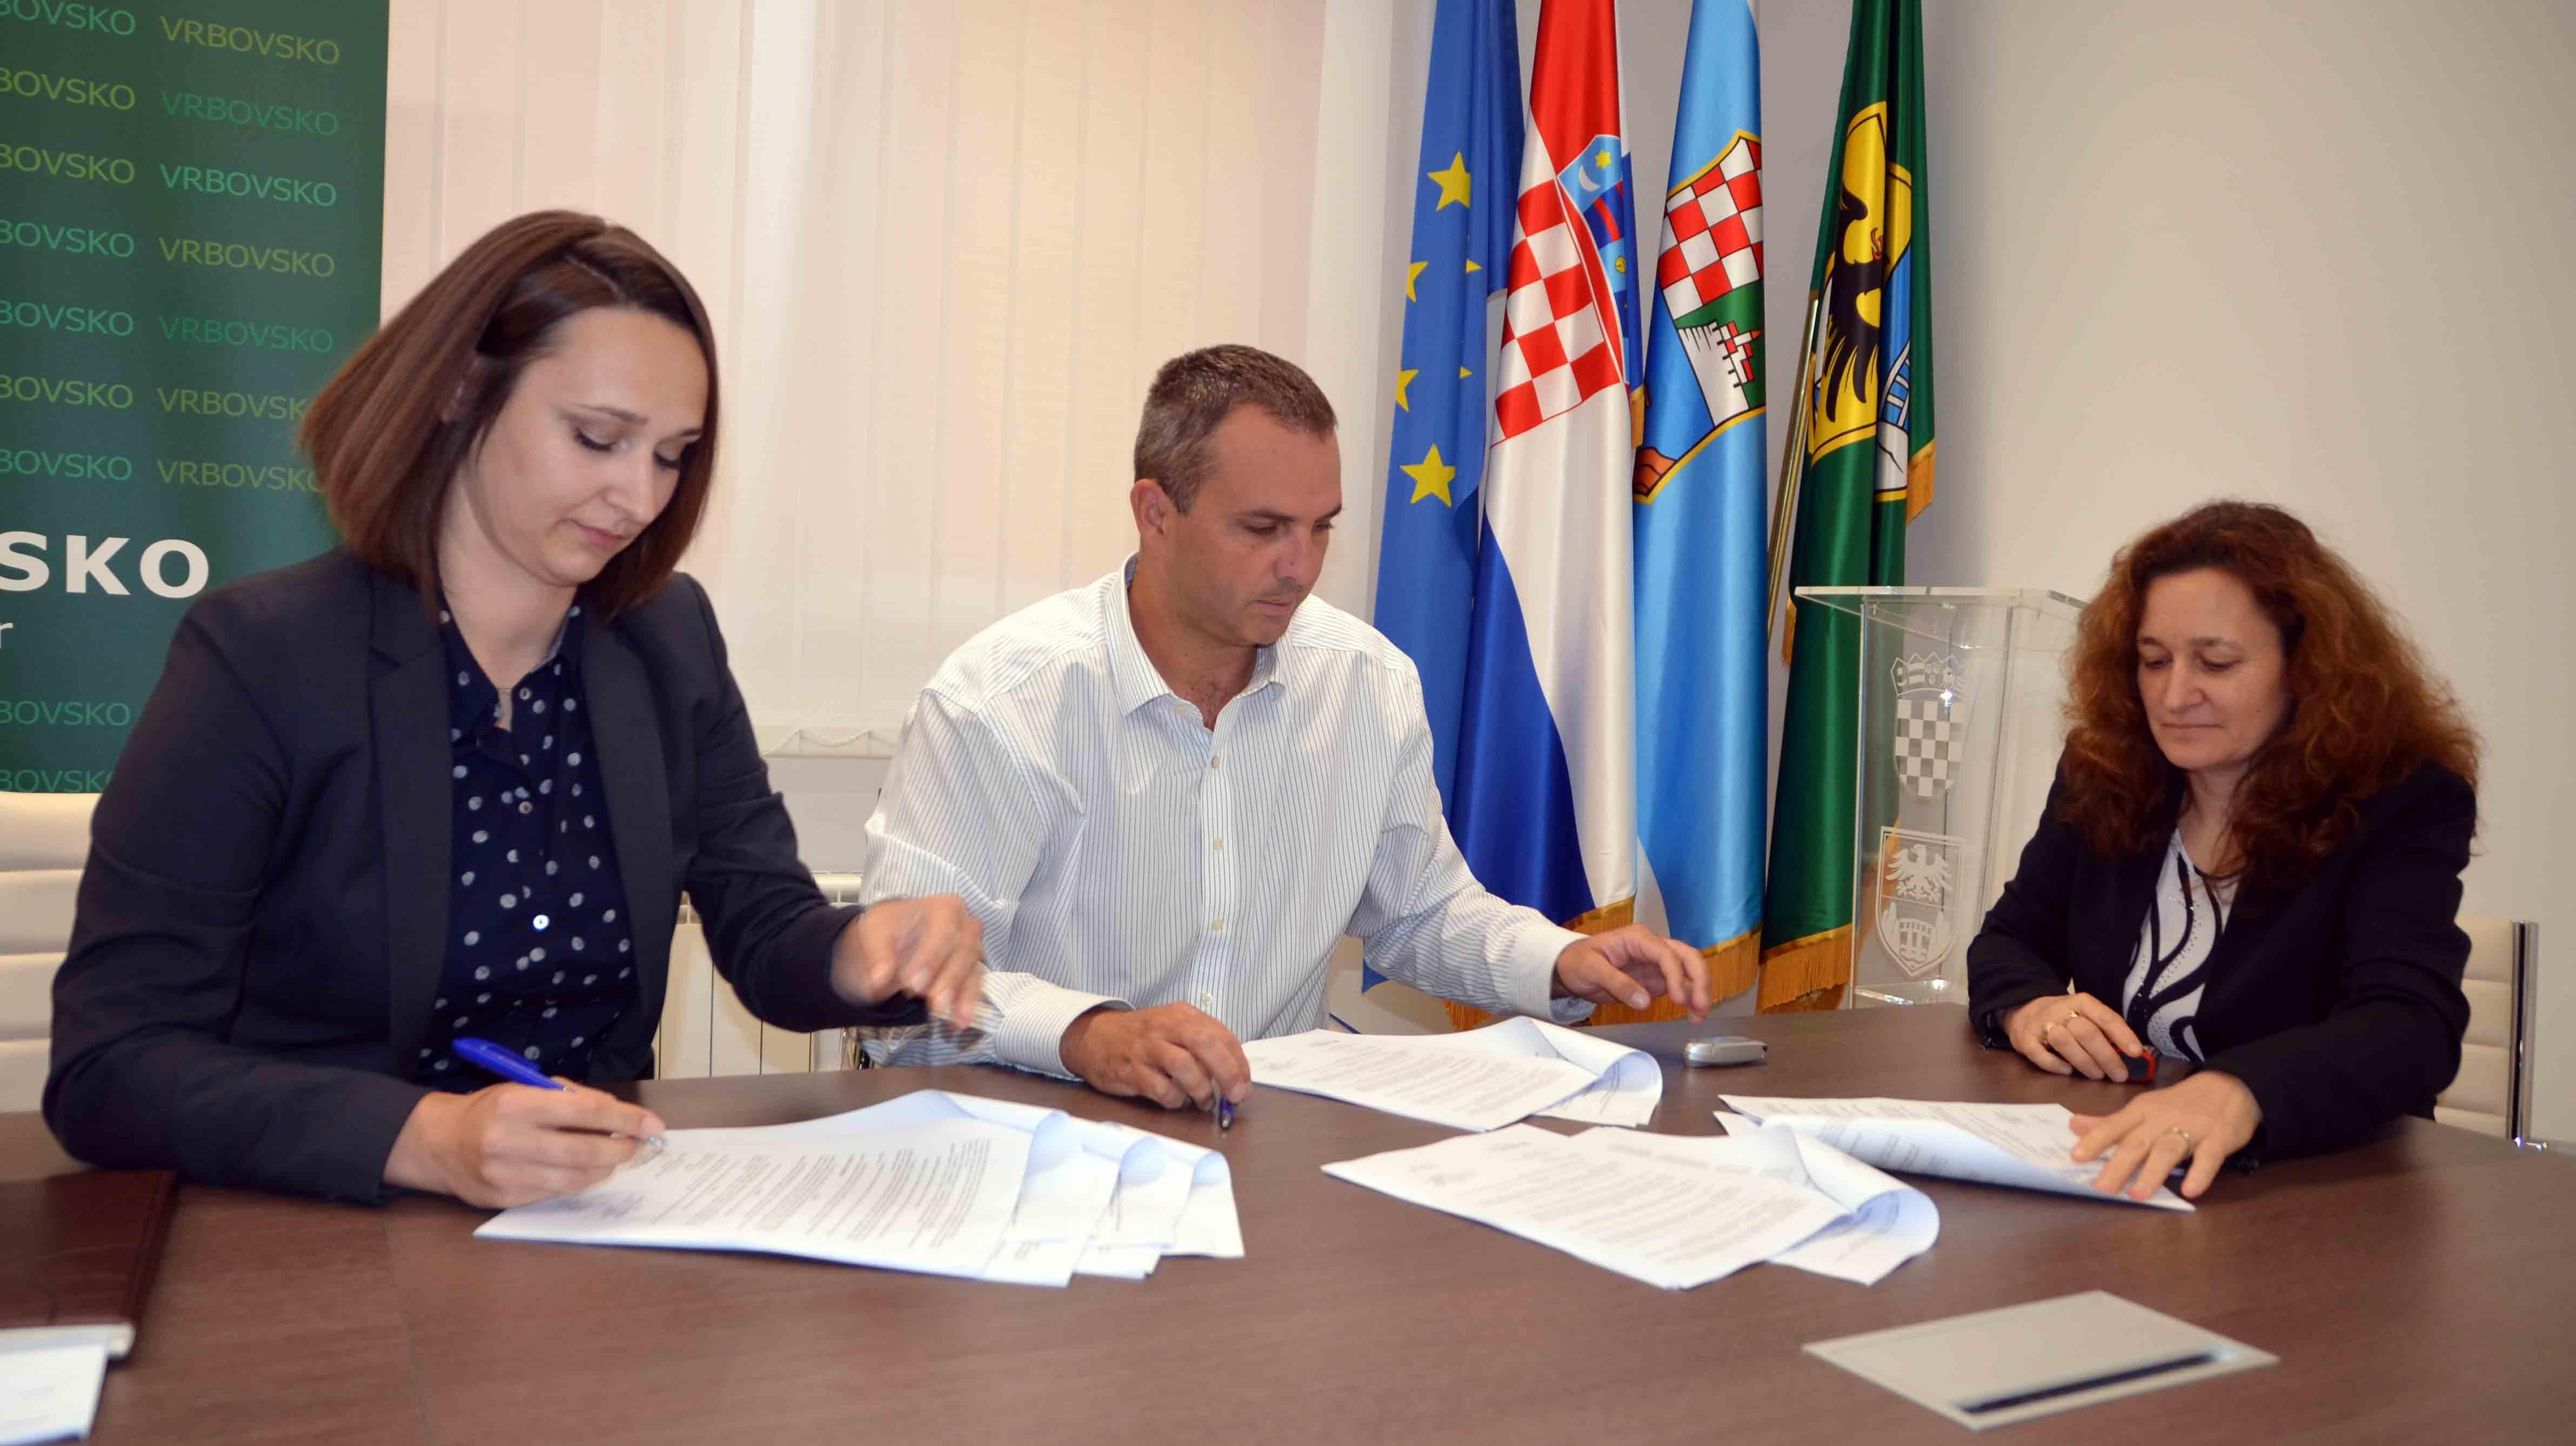 Ugovor su potpisali Nikolina Mamula, Boris Uzelac i Lolita Erent / Snimio Marinko KRMPOTIĆ